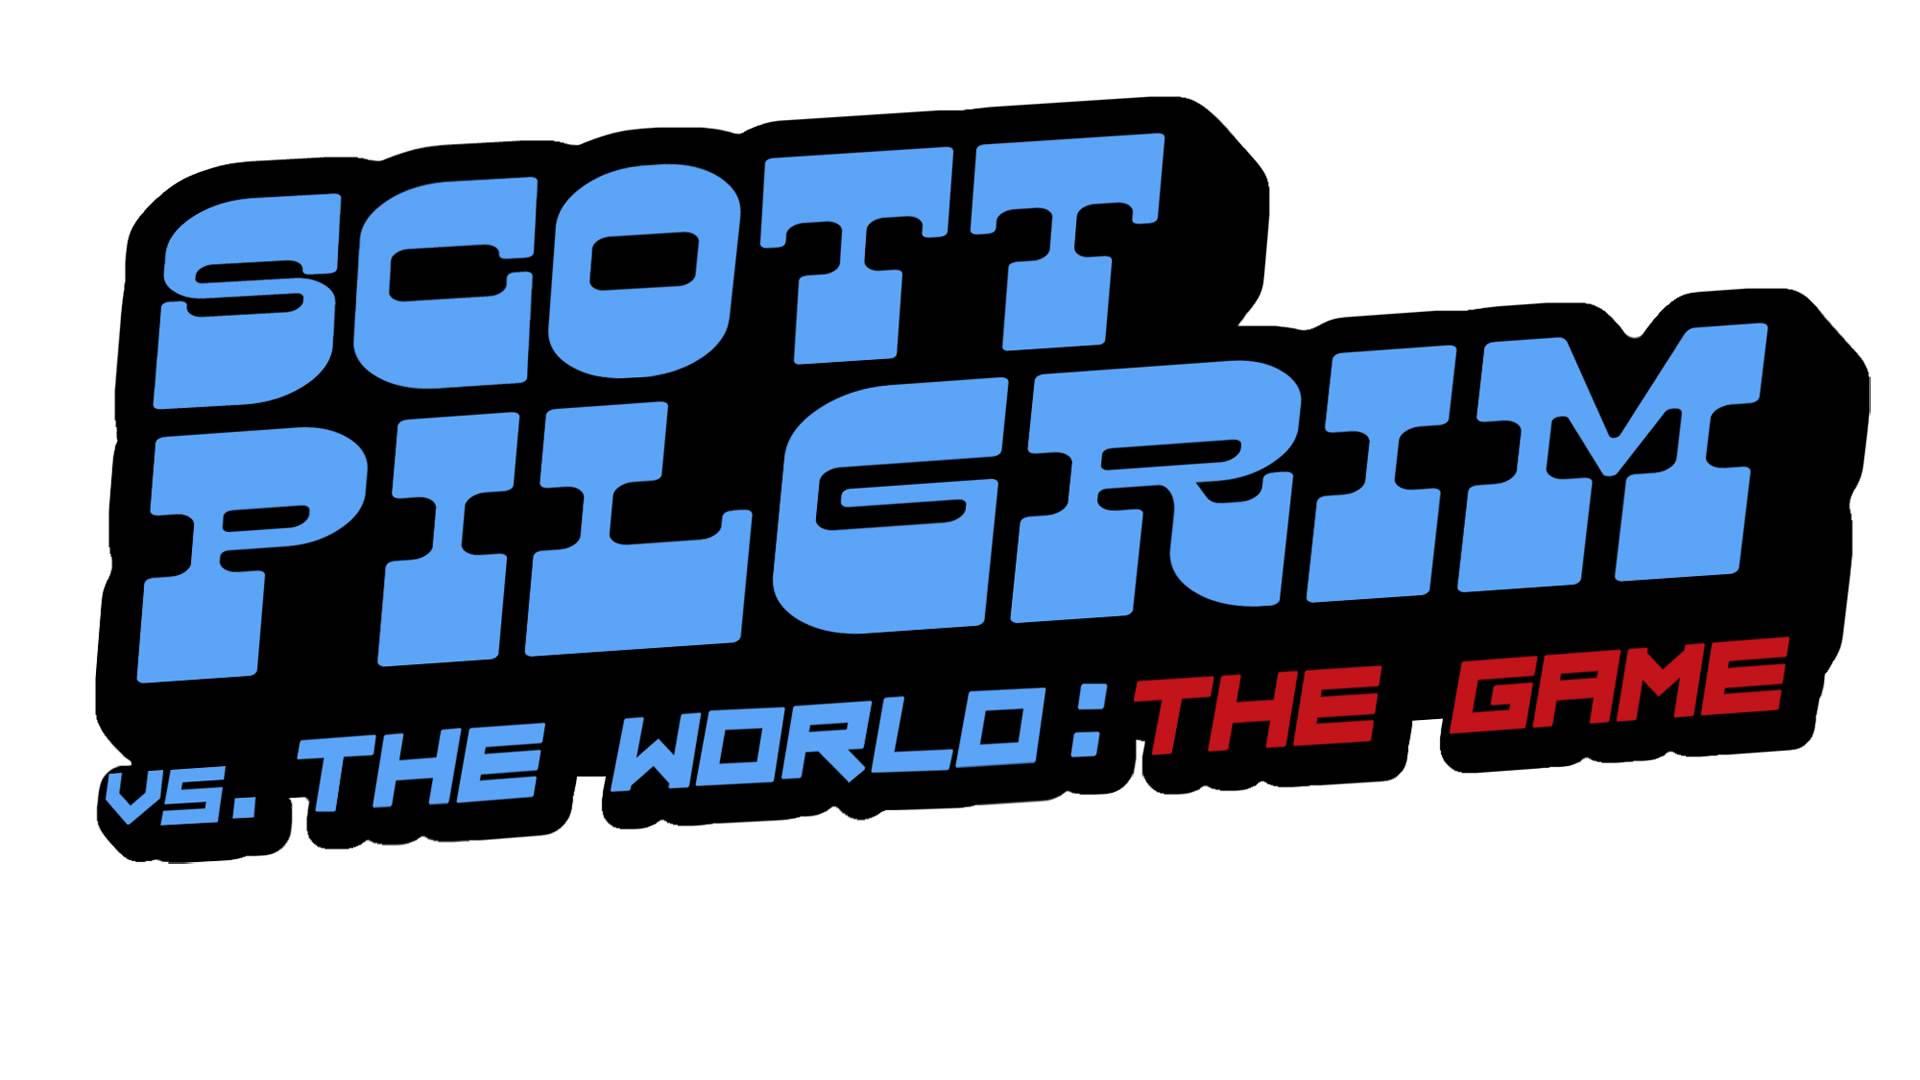 Another Winter - Scott Pilgrim vs. The World: The Game